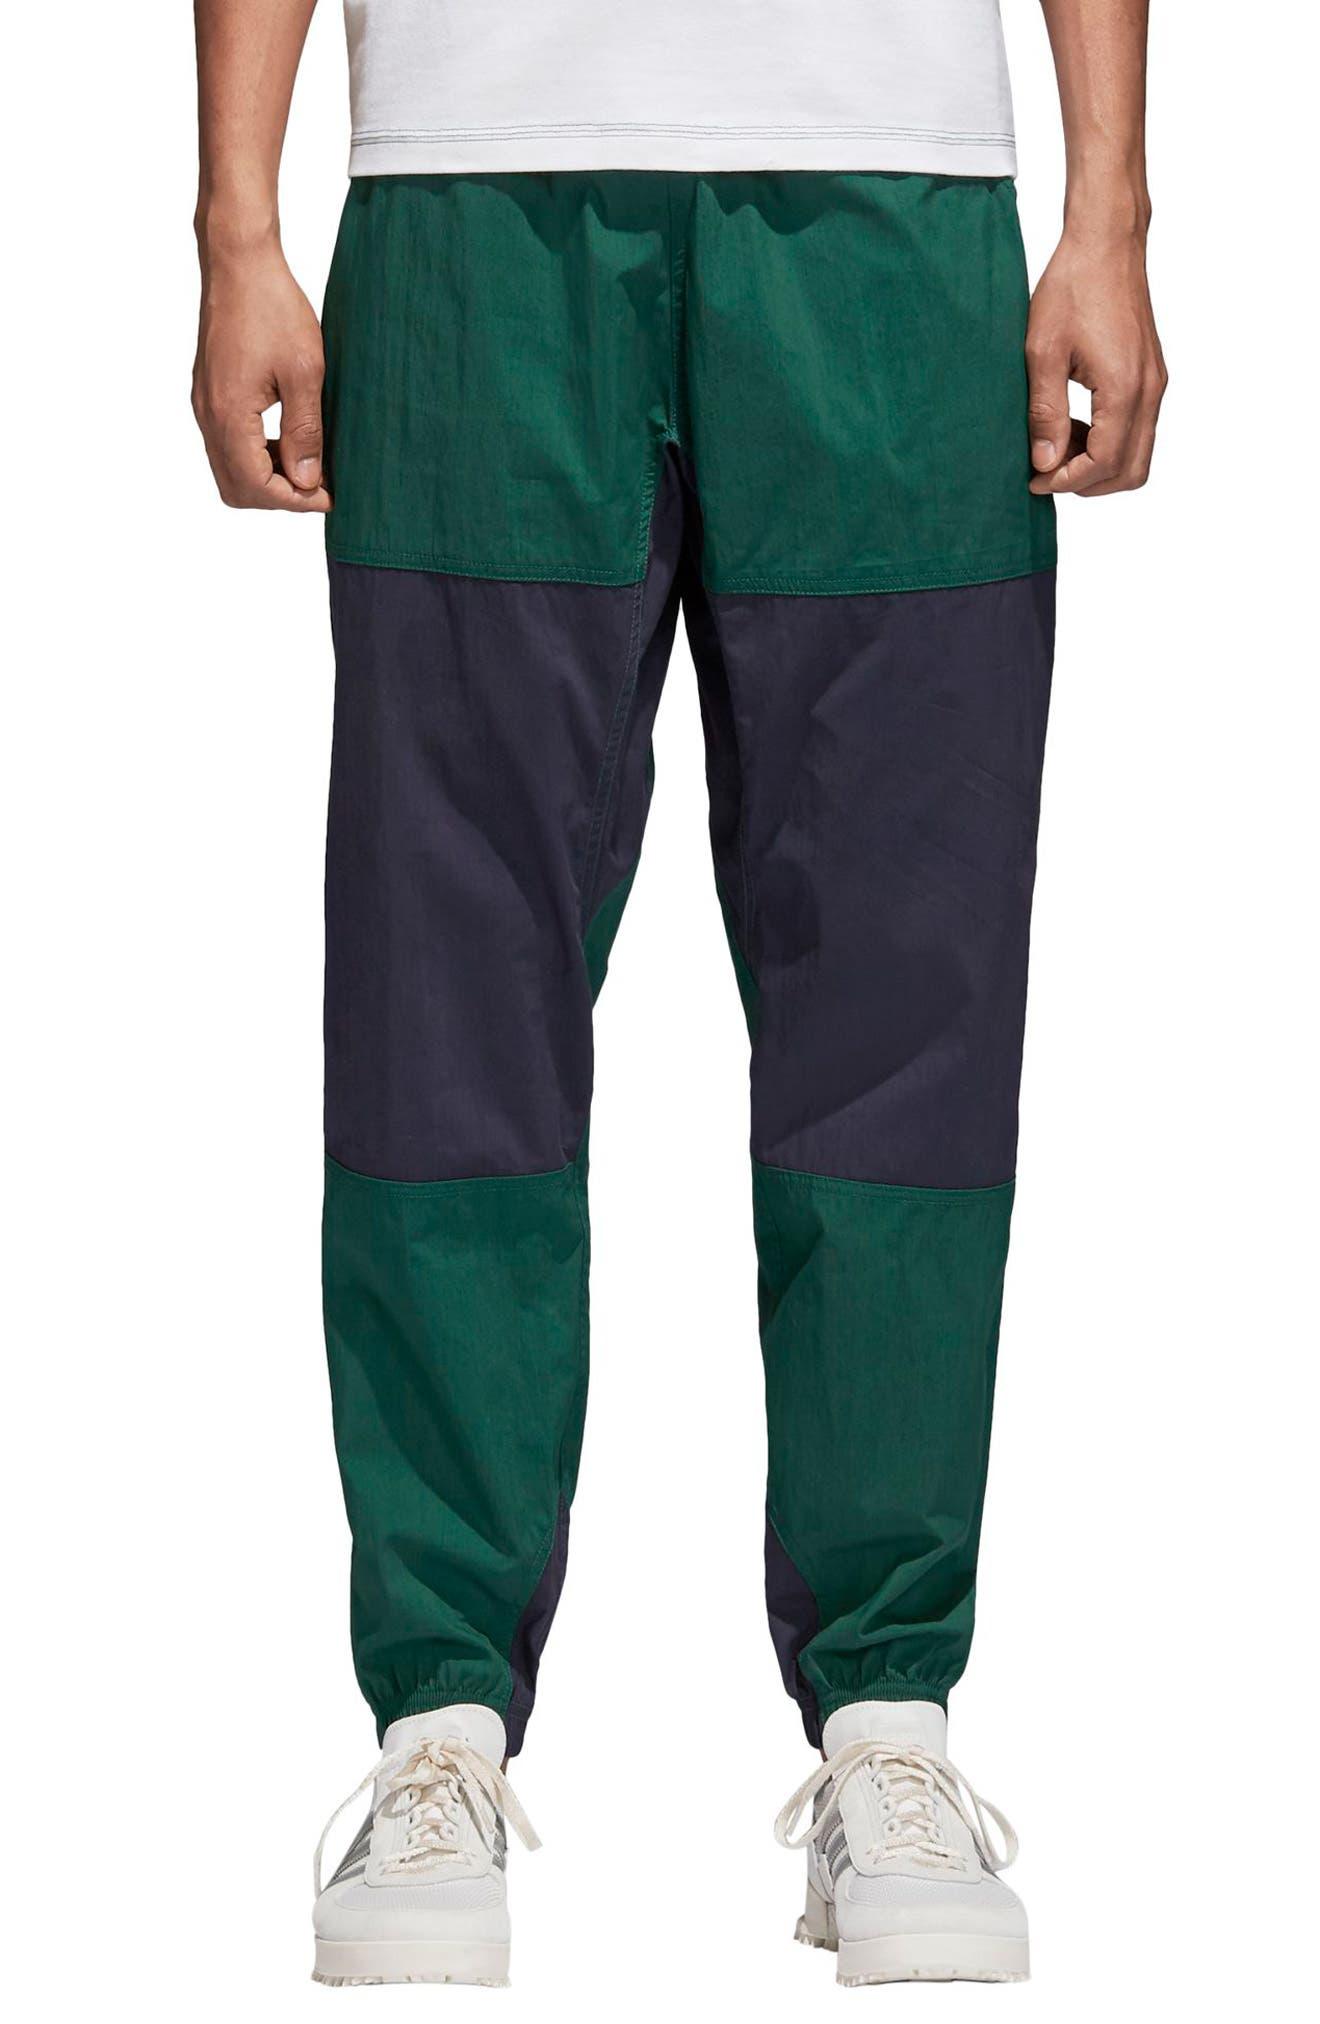 adidas Originals Atric Slim Fit Pants